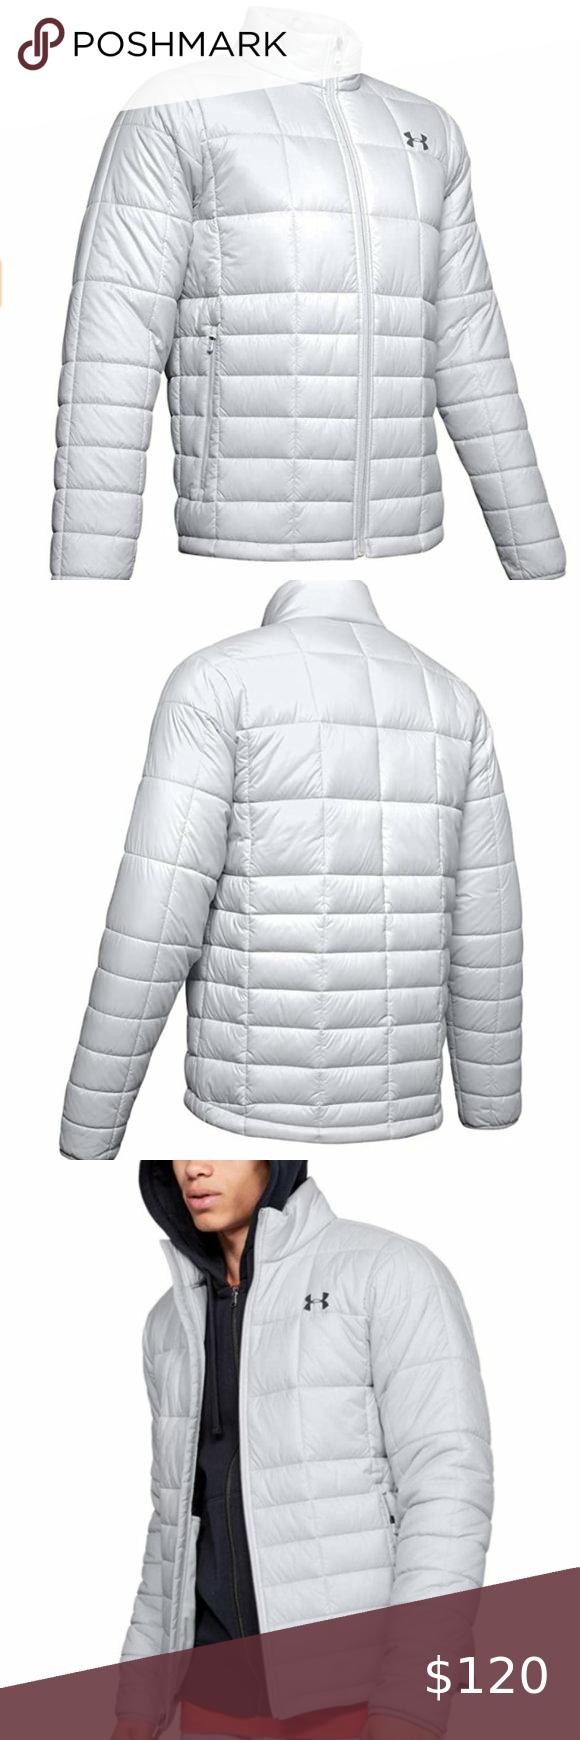 Under Armour Storm Insulated Puffer Jacket Men Xxl Puffer Jacket Men Jackets Puffer Jackets [ 1740 x 580 Pixel ]